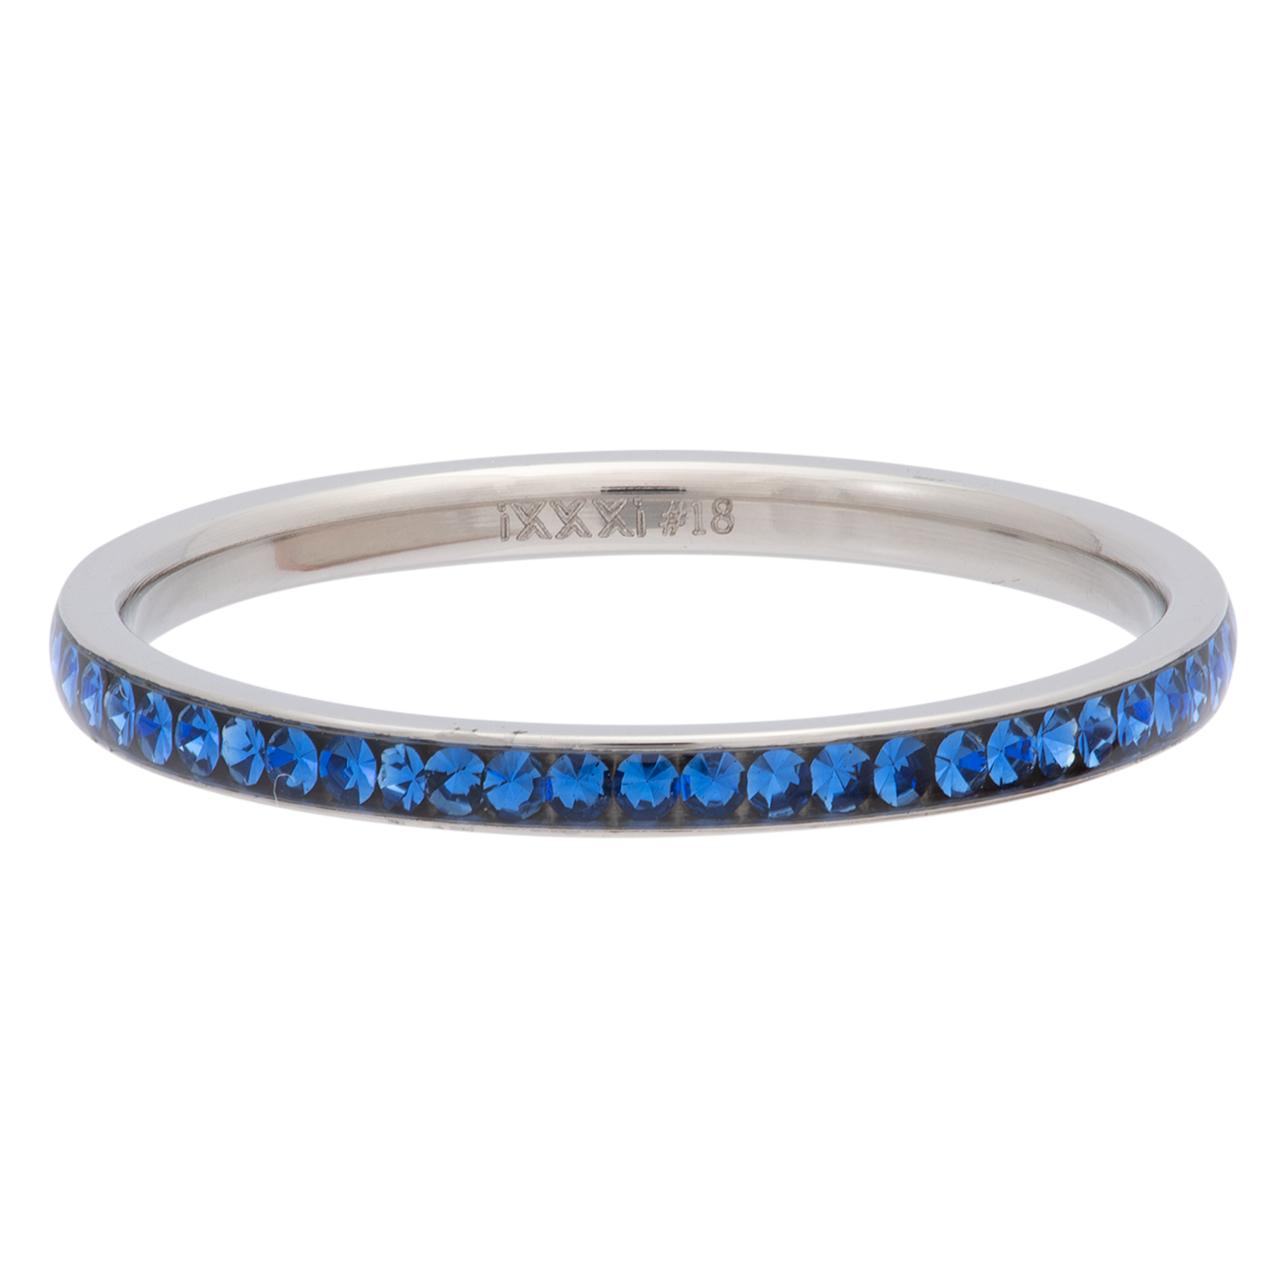 Ixxxi - Zirconia Capri Blue R02521